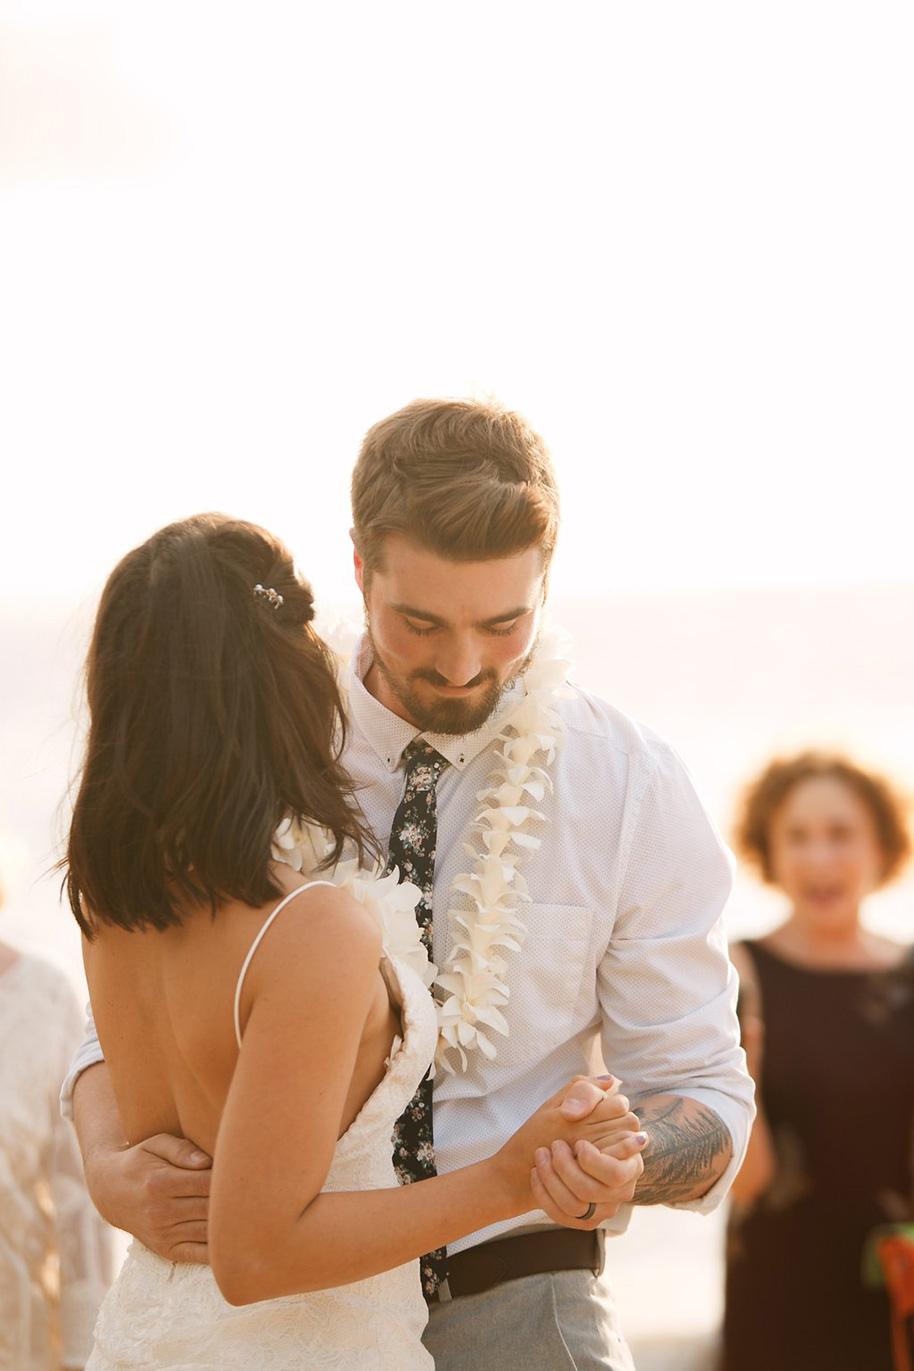 Maui-Beach-Wedding-070616-15